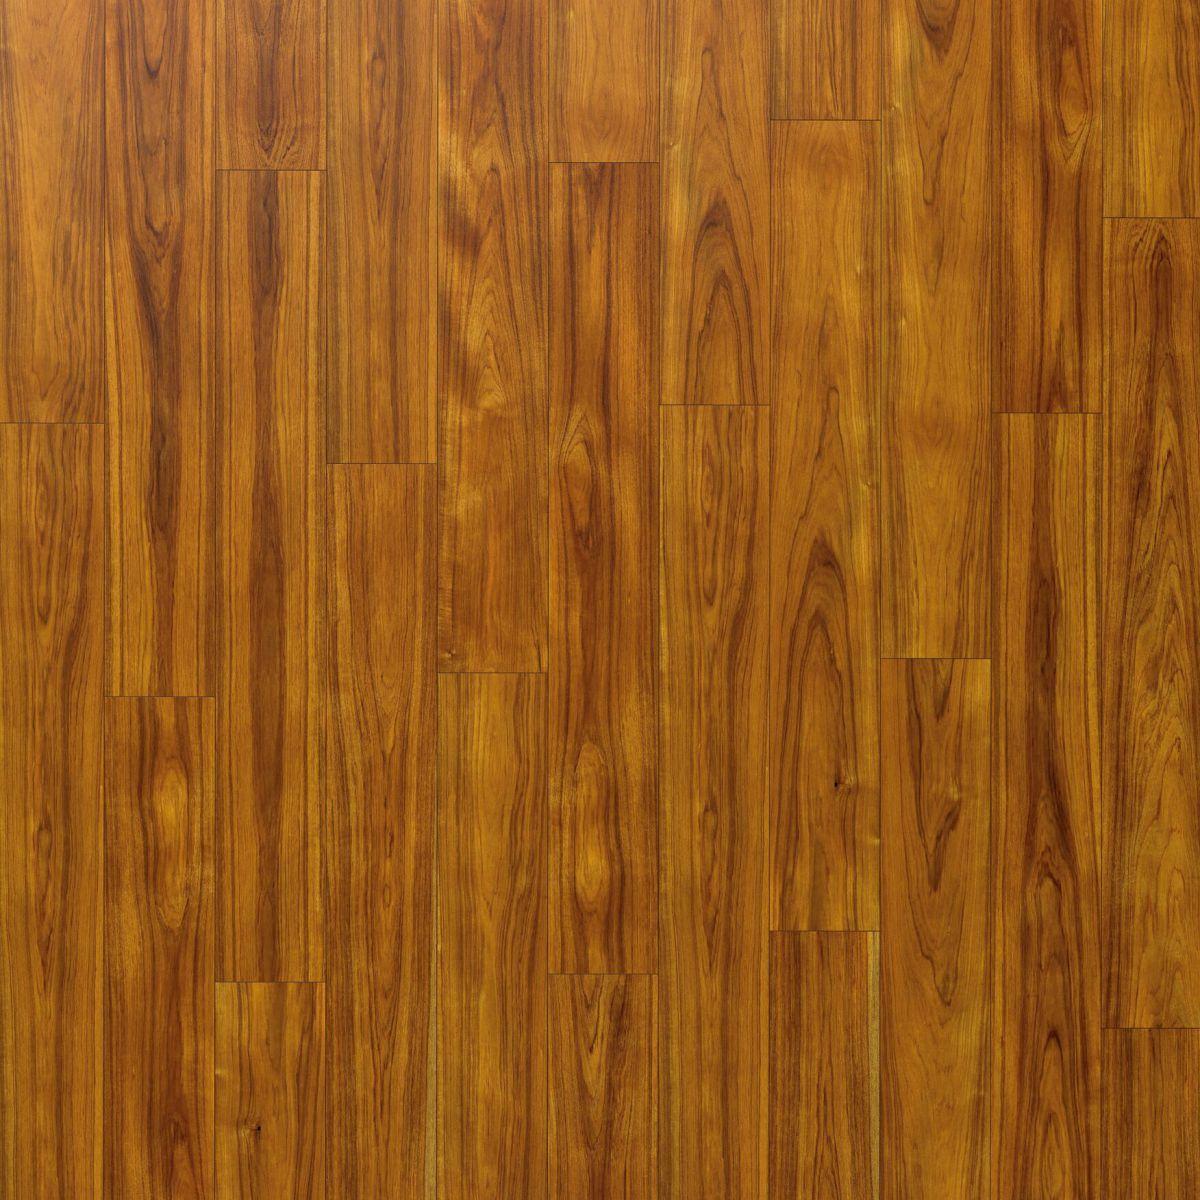 Avatara vloerdelen hout N06 plan